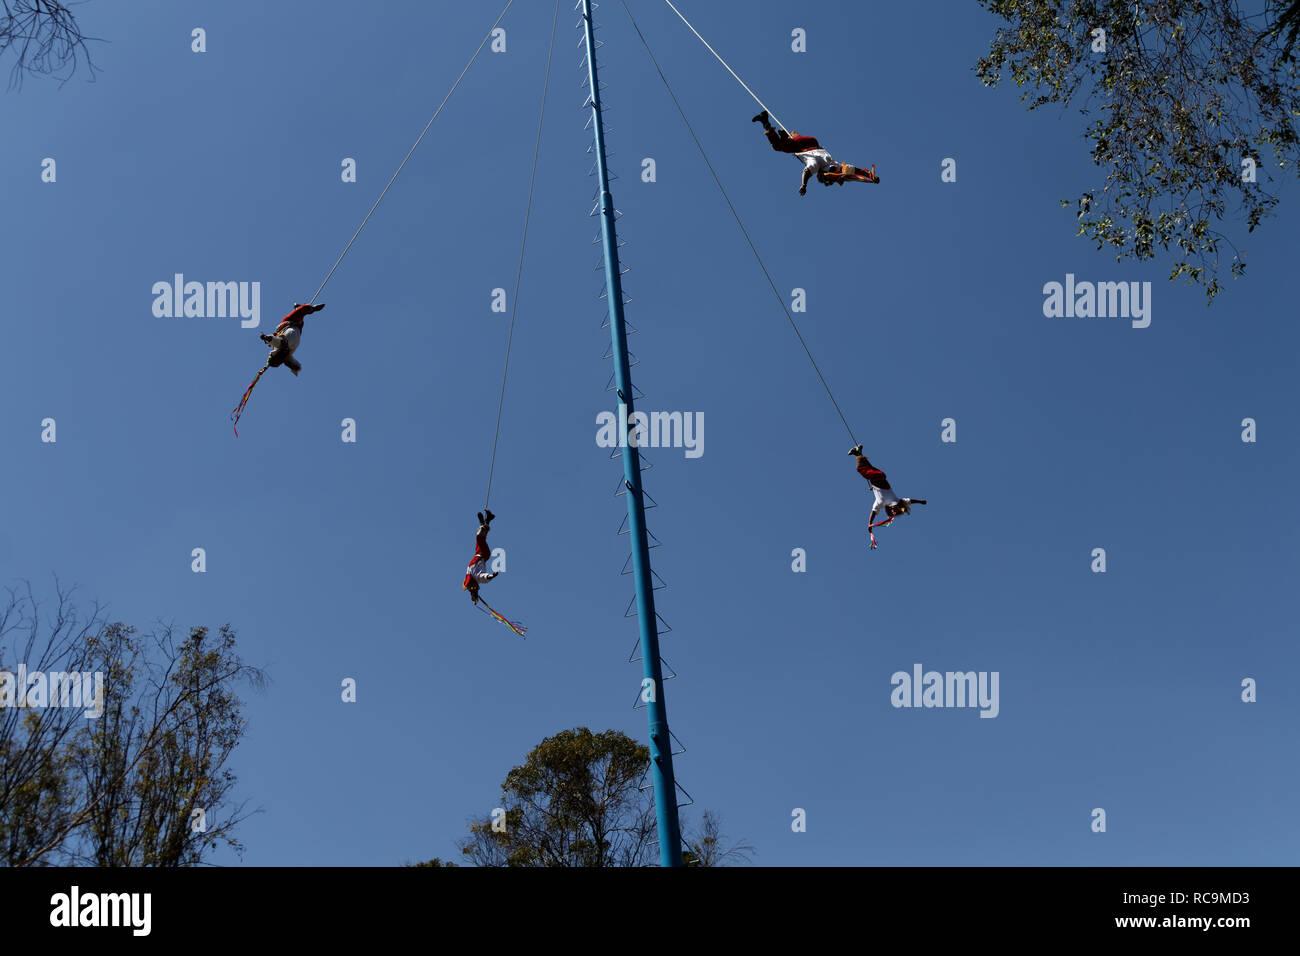 Voladores de Papantla - tradiitonal native acrobats. - Stock Image